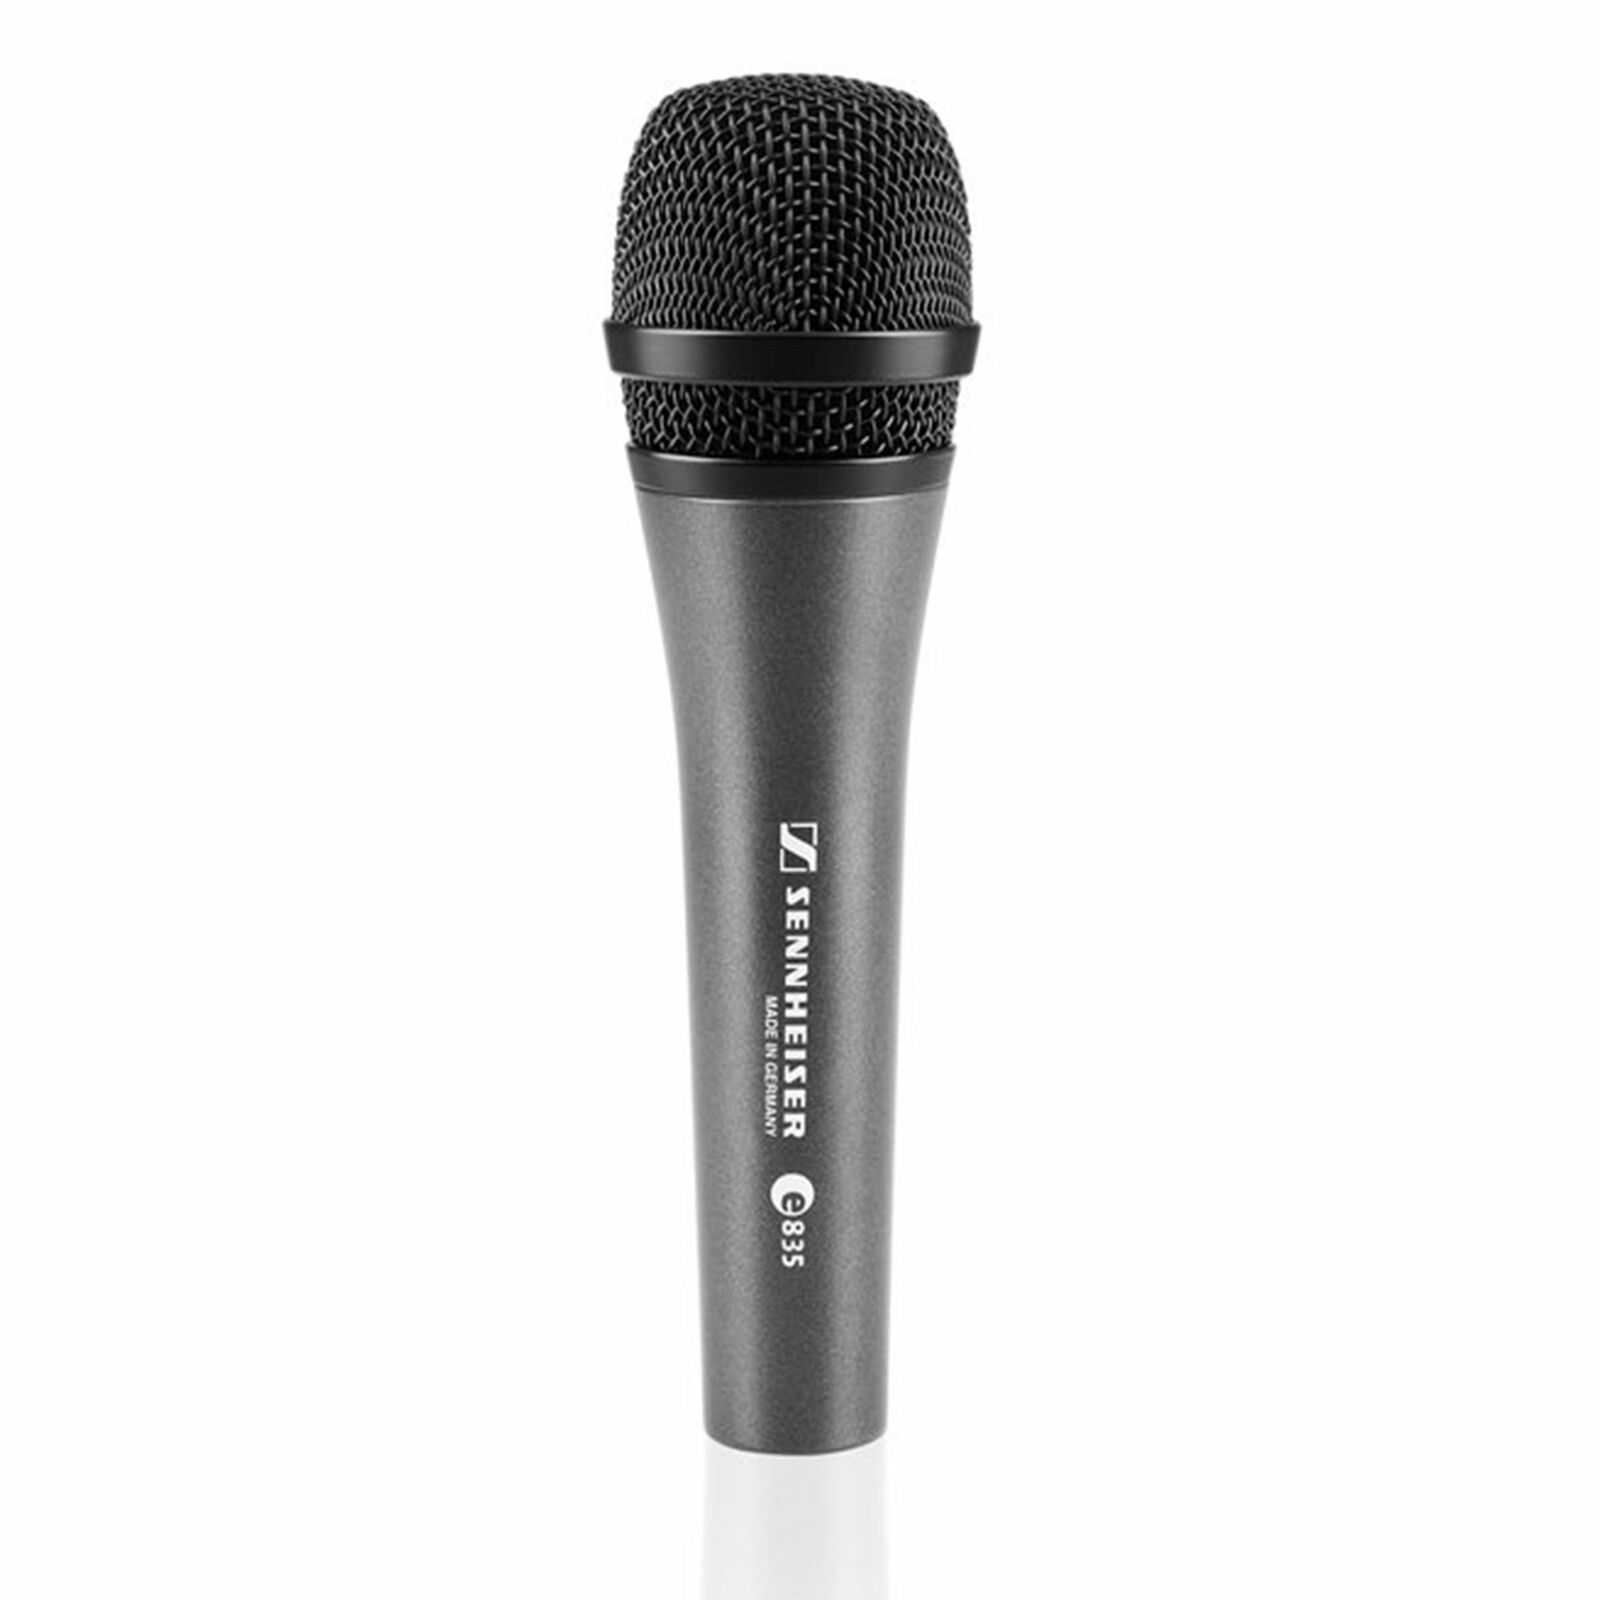 Sennheiser e845 Dynamic Vocal Mic